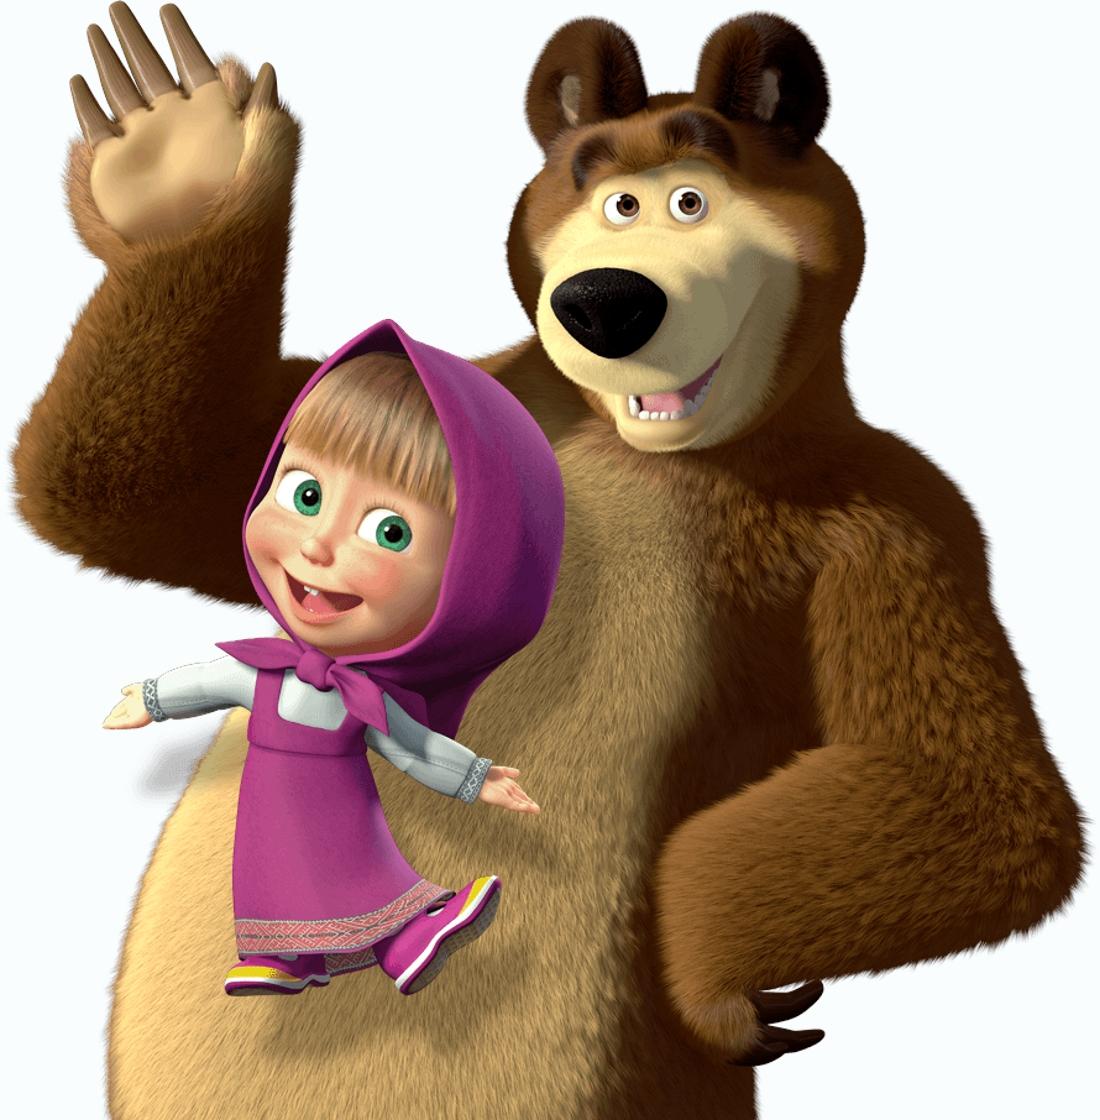 маша и медведь картинки на прозрачном фоне тоже долгое